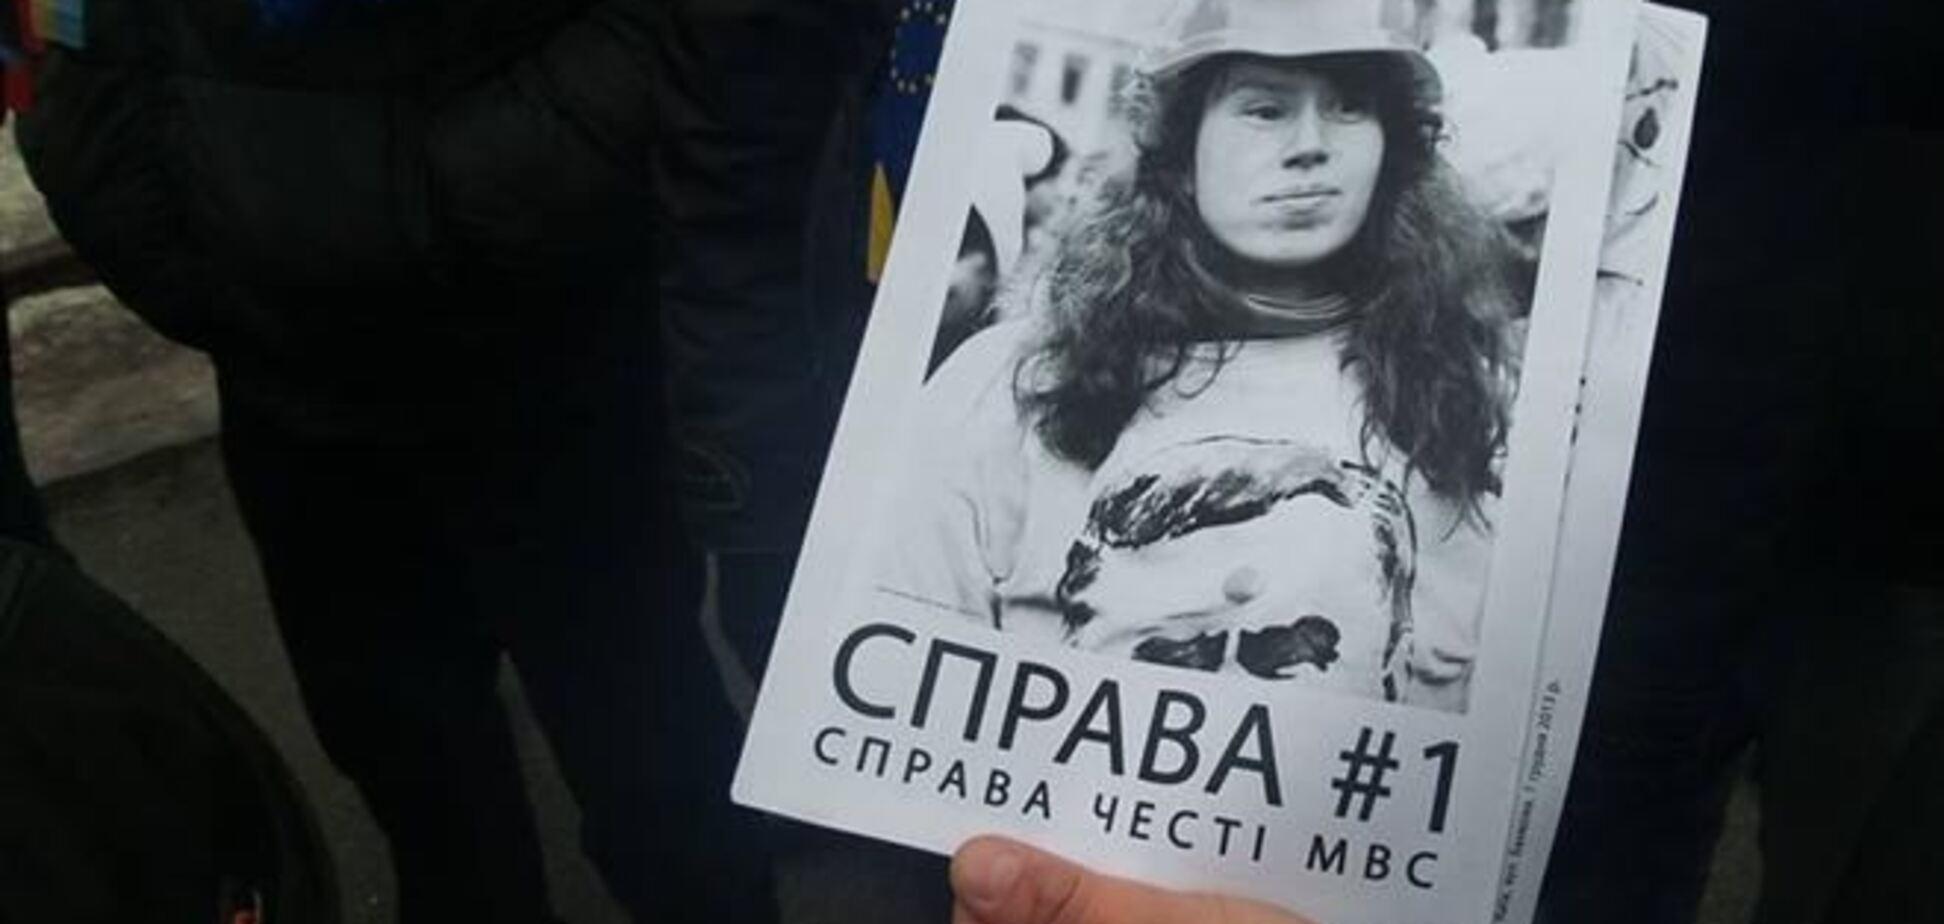 Генпрокурору передали запись c видеорегистратора Чорновол